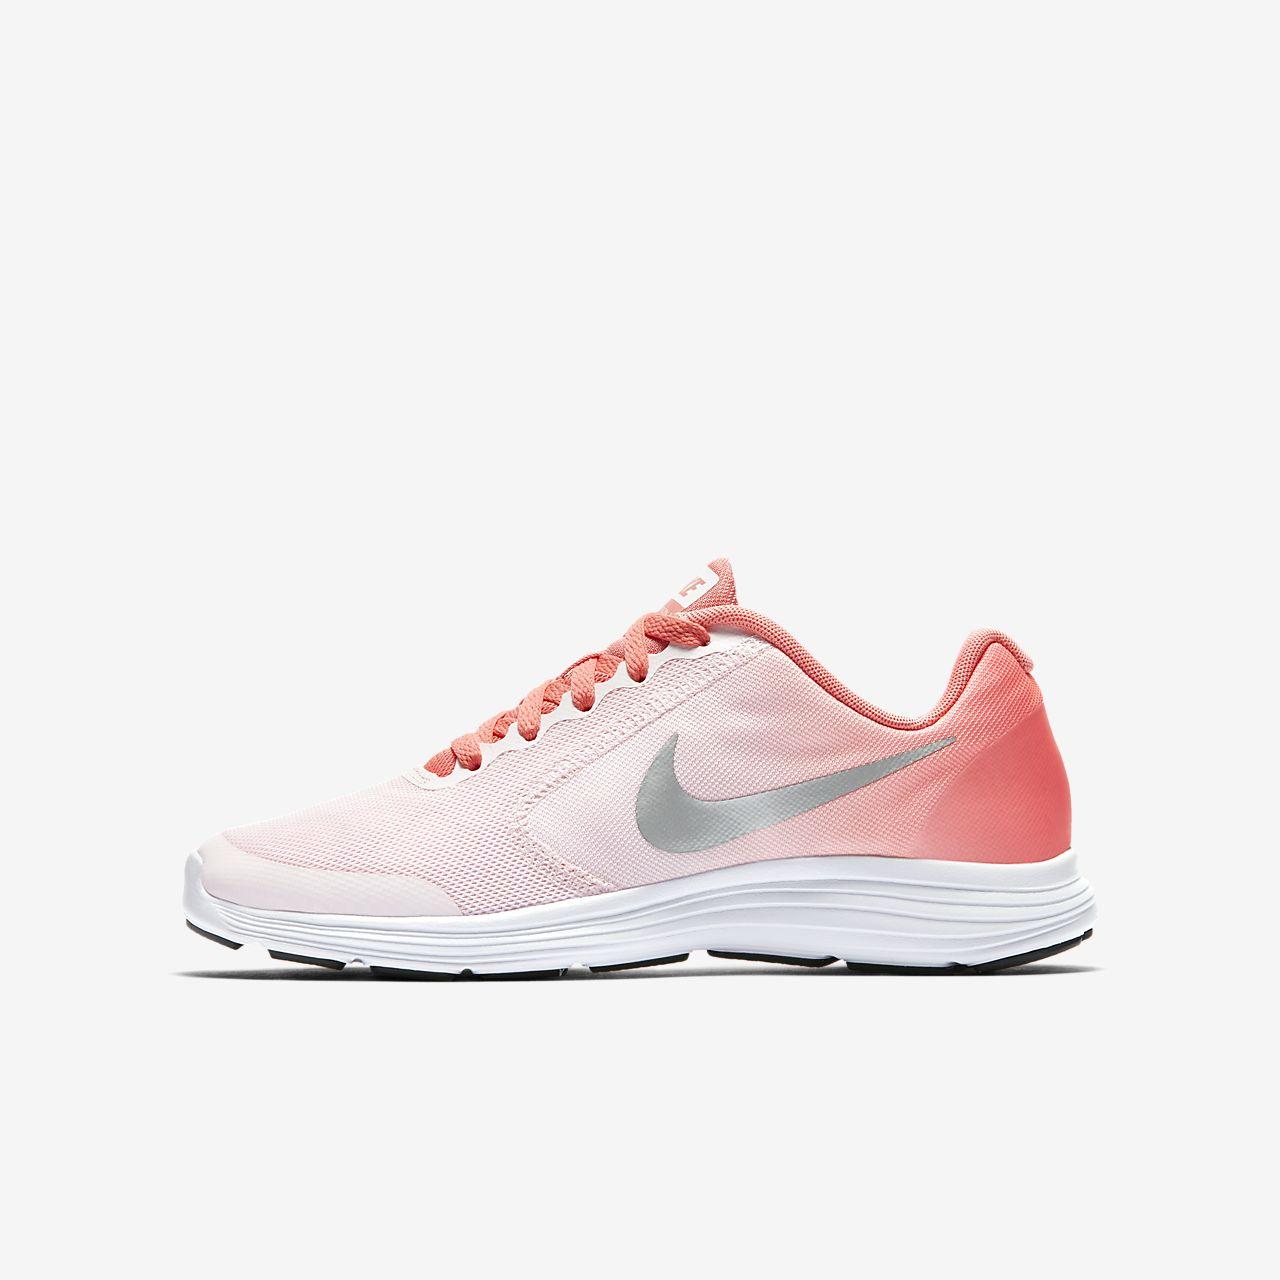 517714328 Calzado de running para niños talla grande Nike Revolution 3. Nike ...